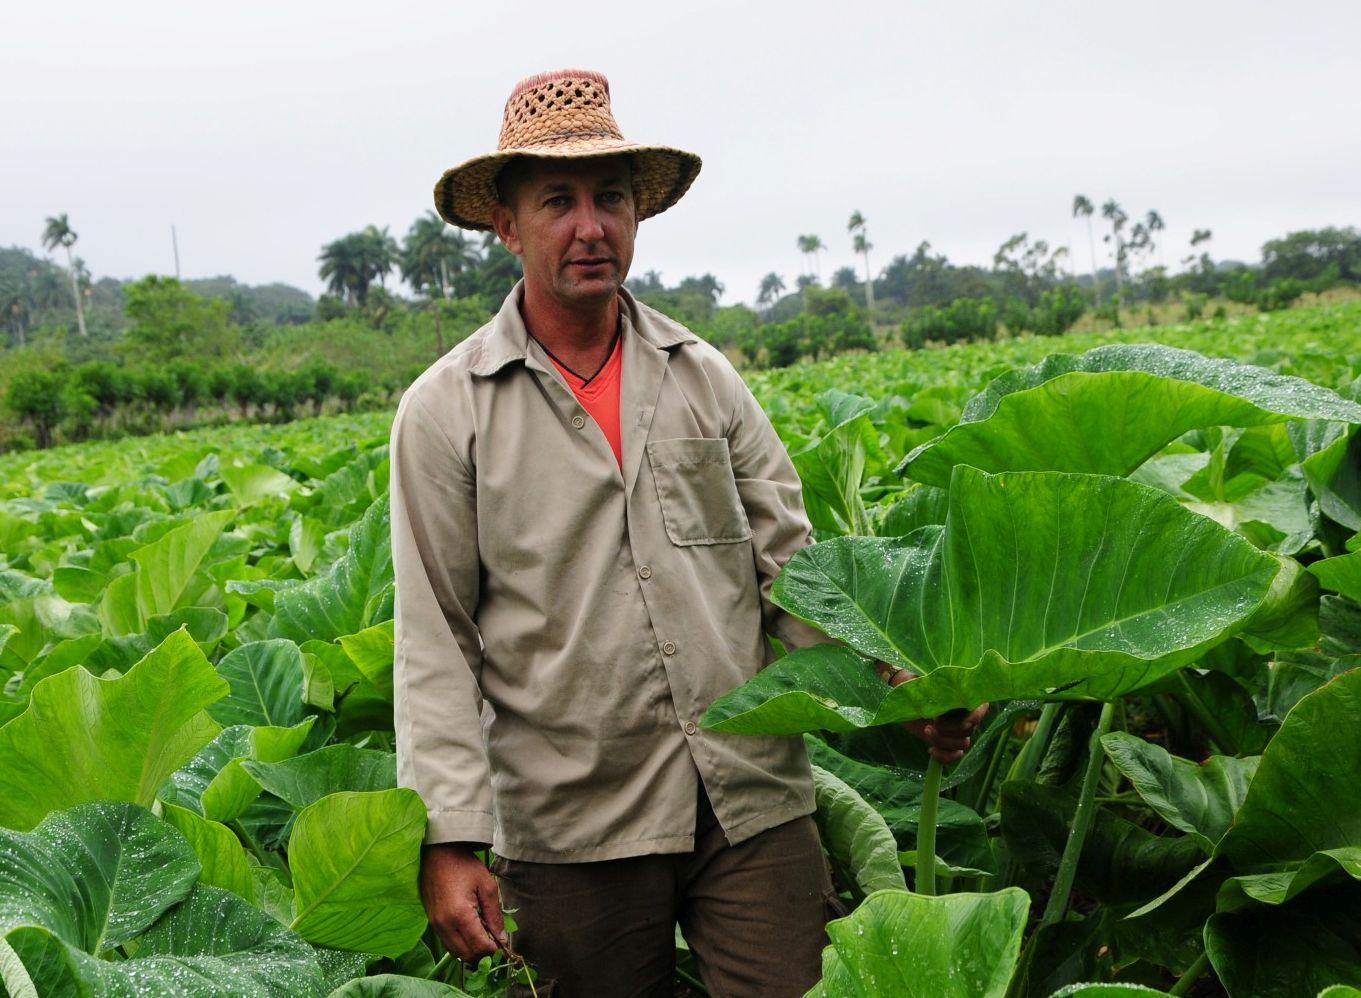 sancti spiritus, agricultuta, yaguajay